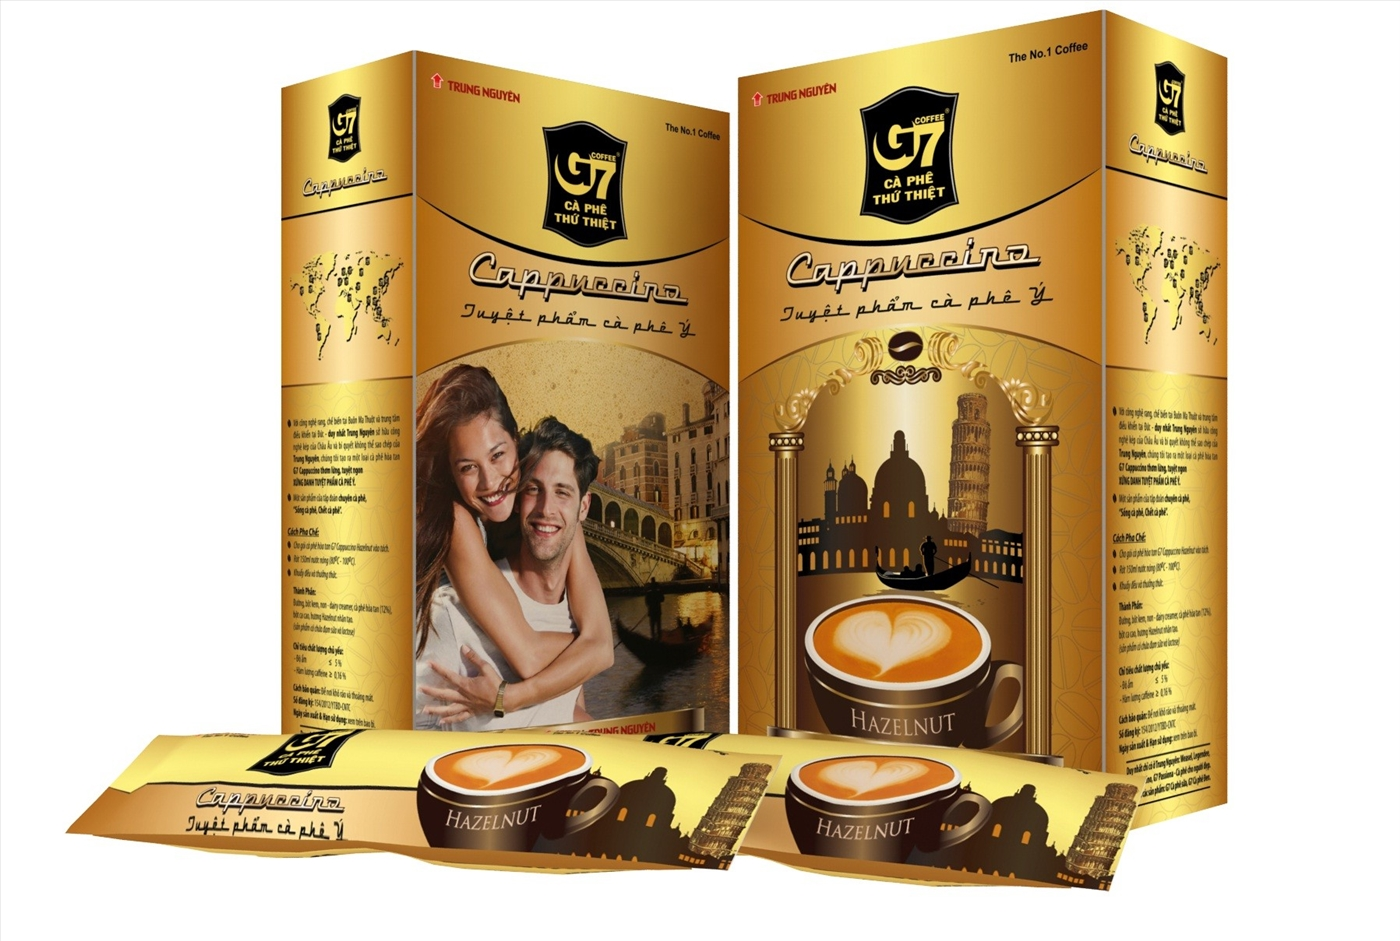 G7 Cappuccino Hazelnut 6 boxes x 12 sachets x 18g